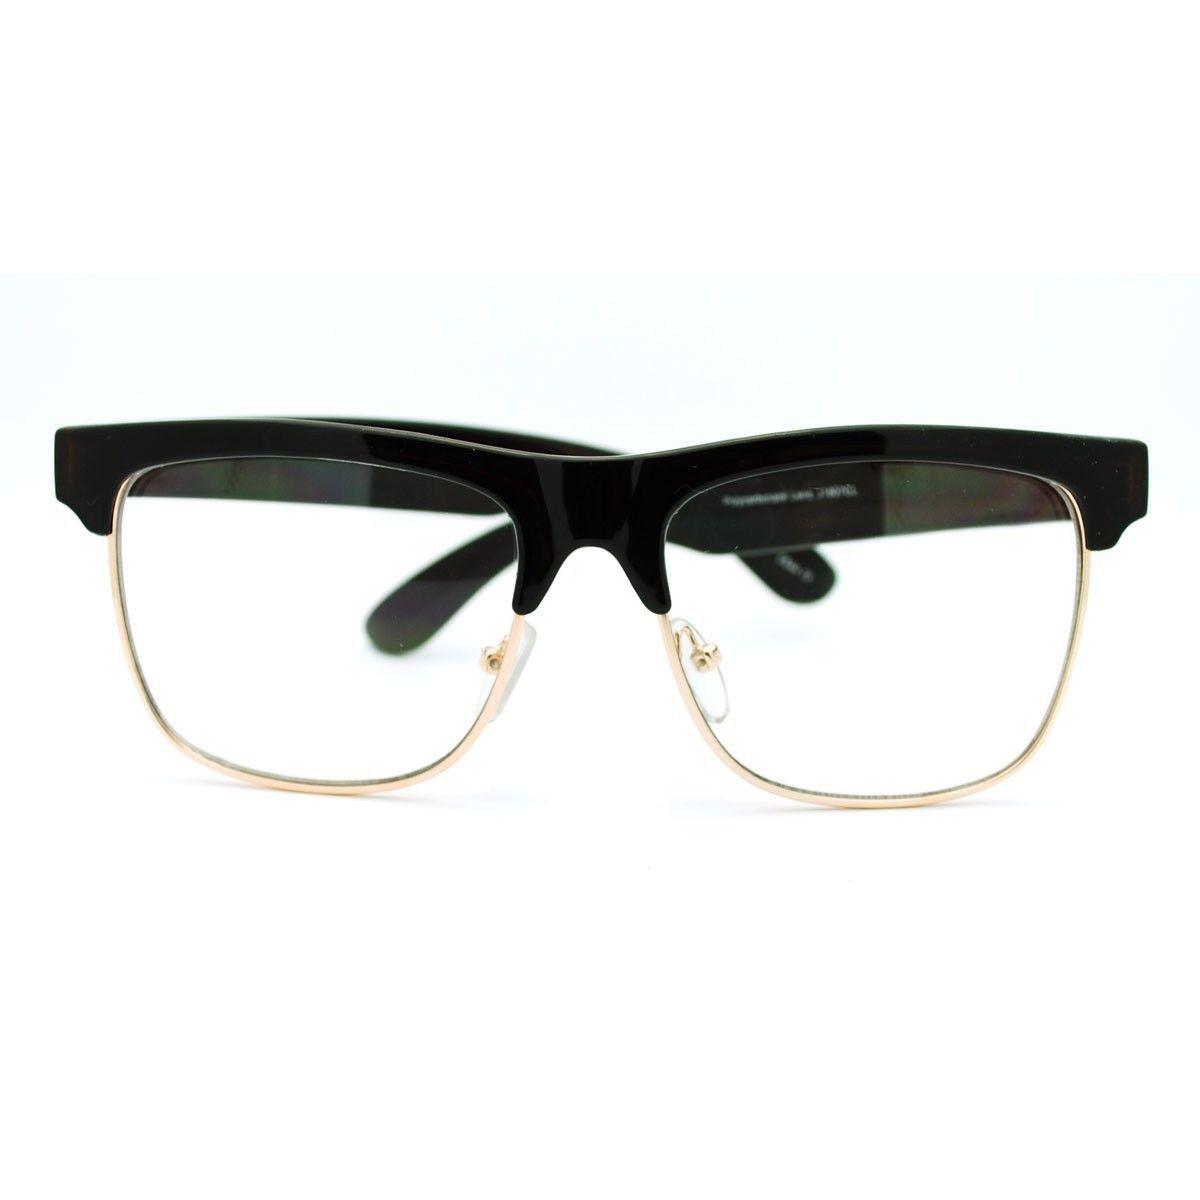 Clear Lens Glasses Square Half Rim Modern Smart Look Eyeglasses